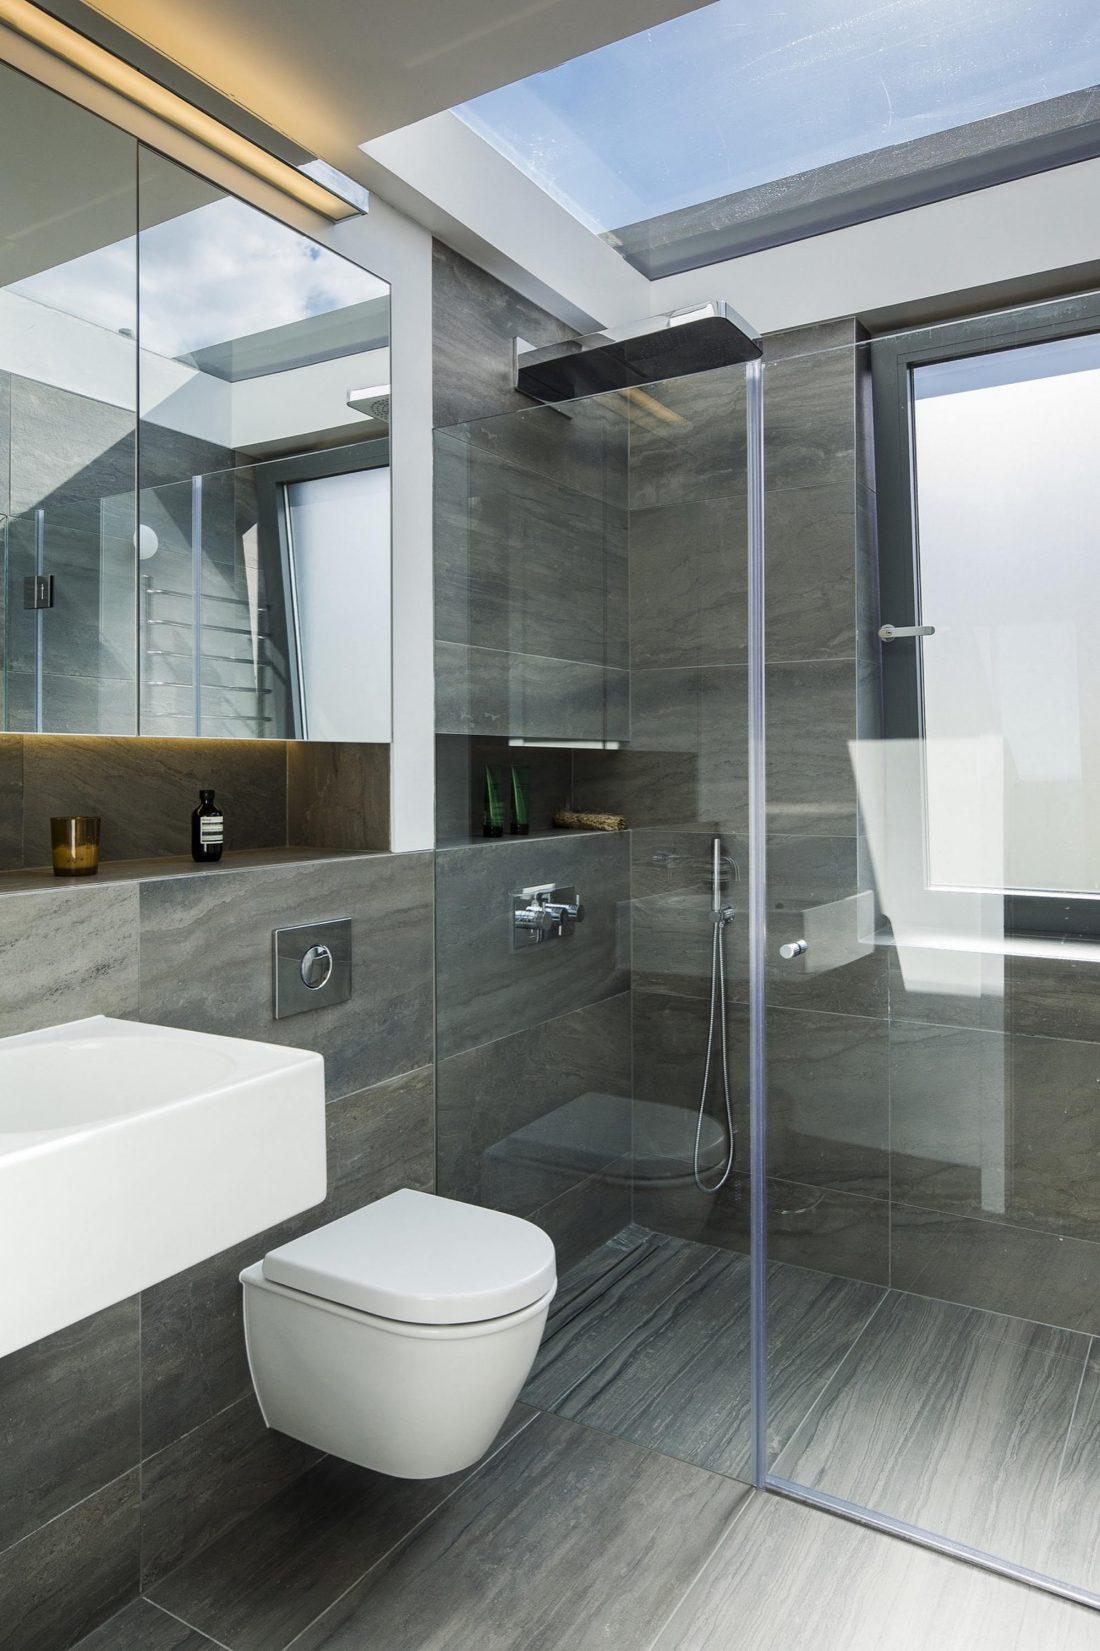 Дом Брекенбури от студии Neil Dusheiko Architects 12